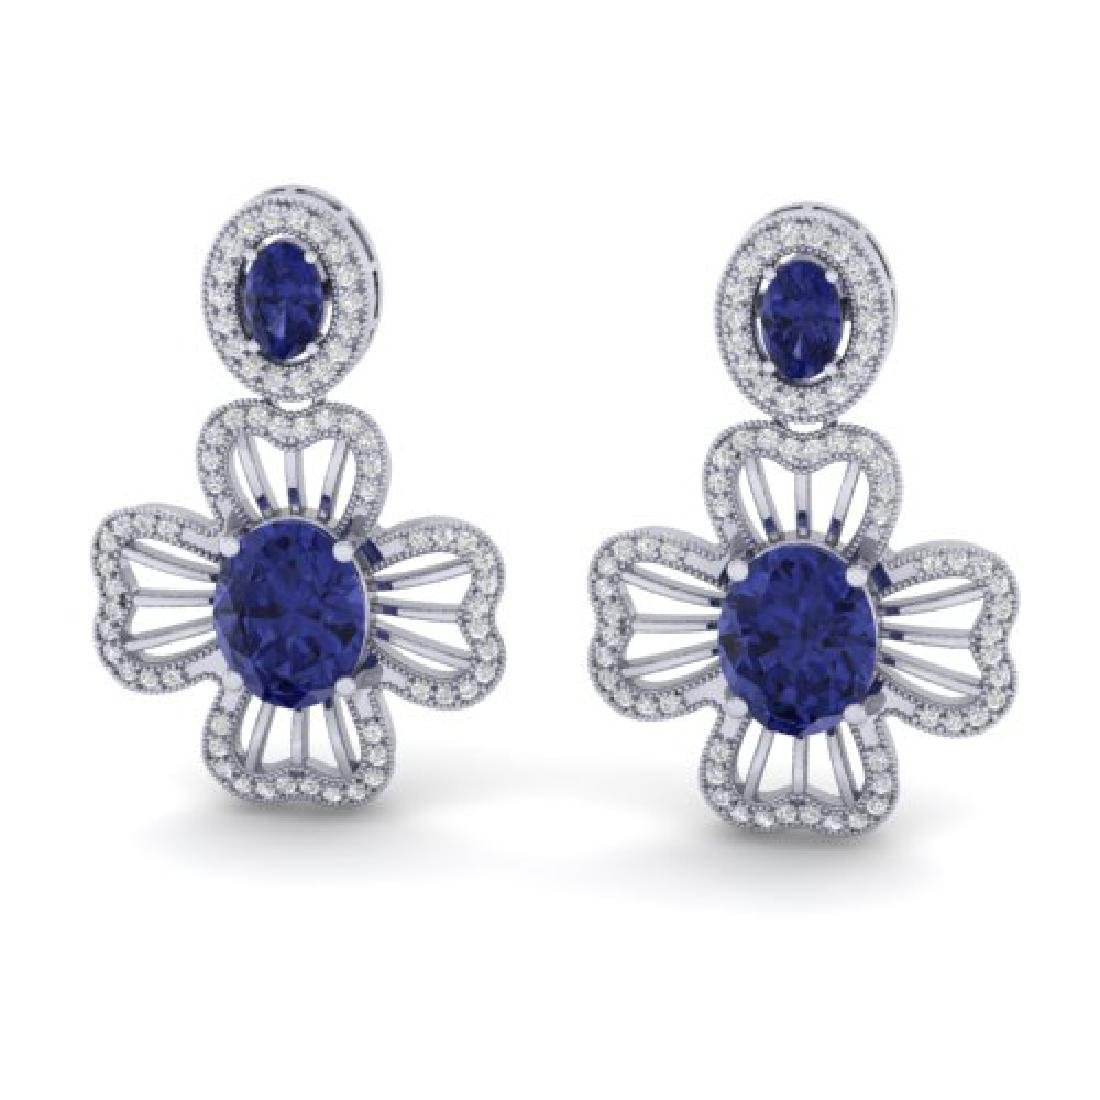 9.26 CTW Tanzanite & Micro Pave VS/SI Diamond Earrings